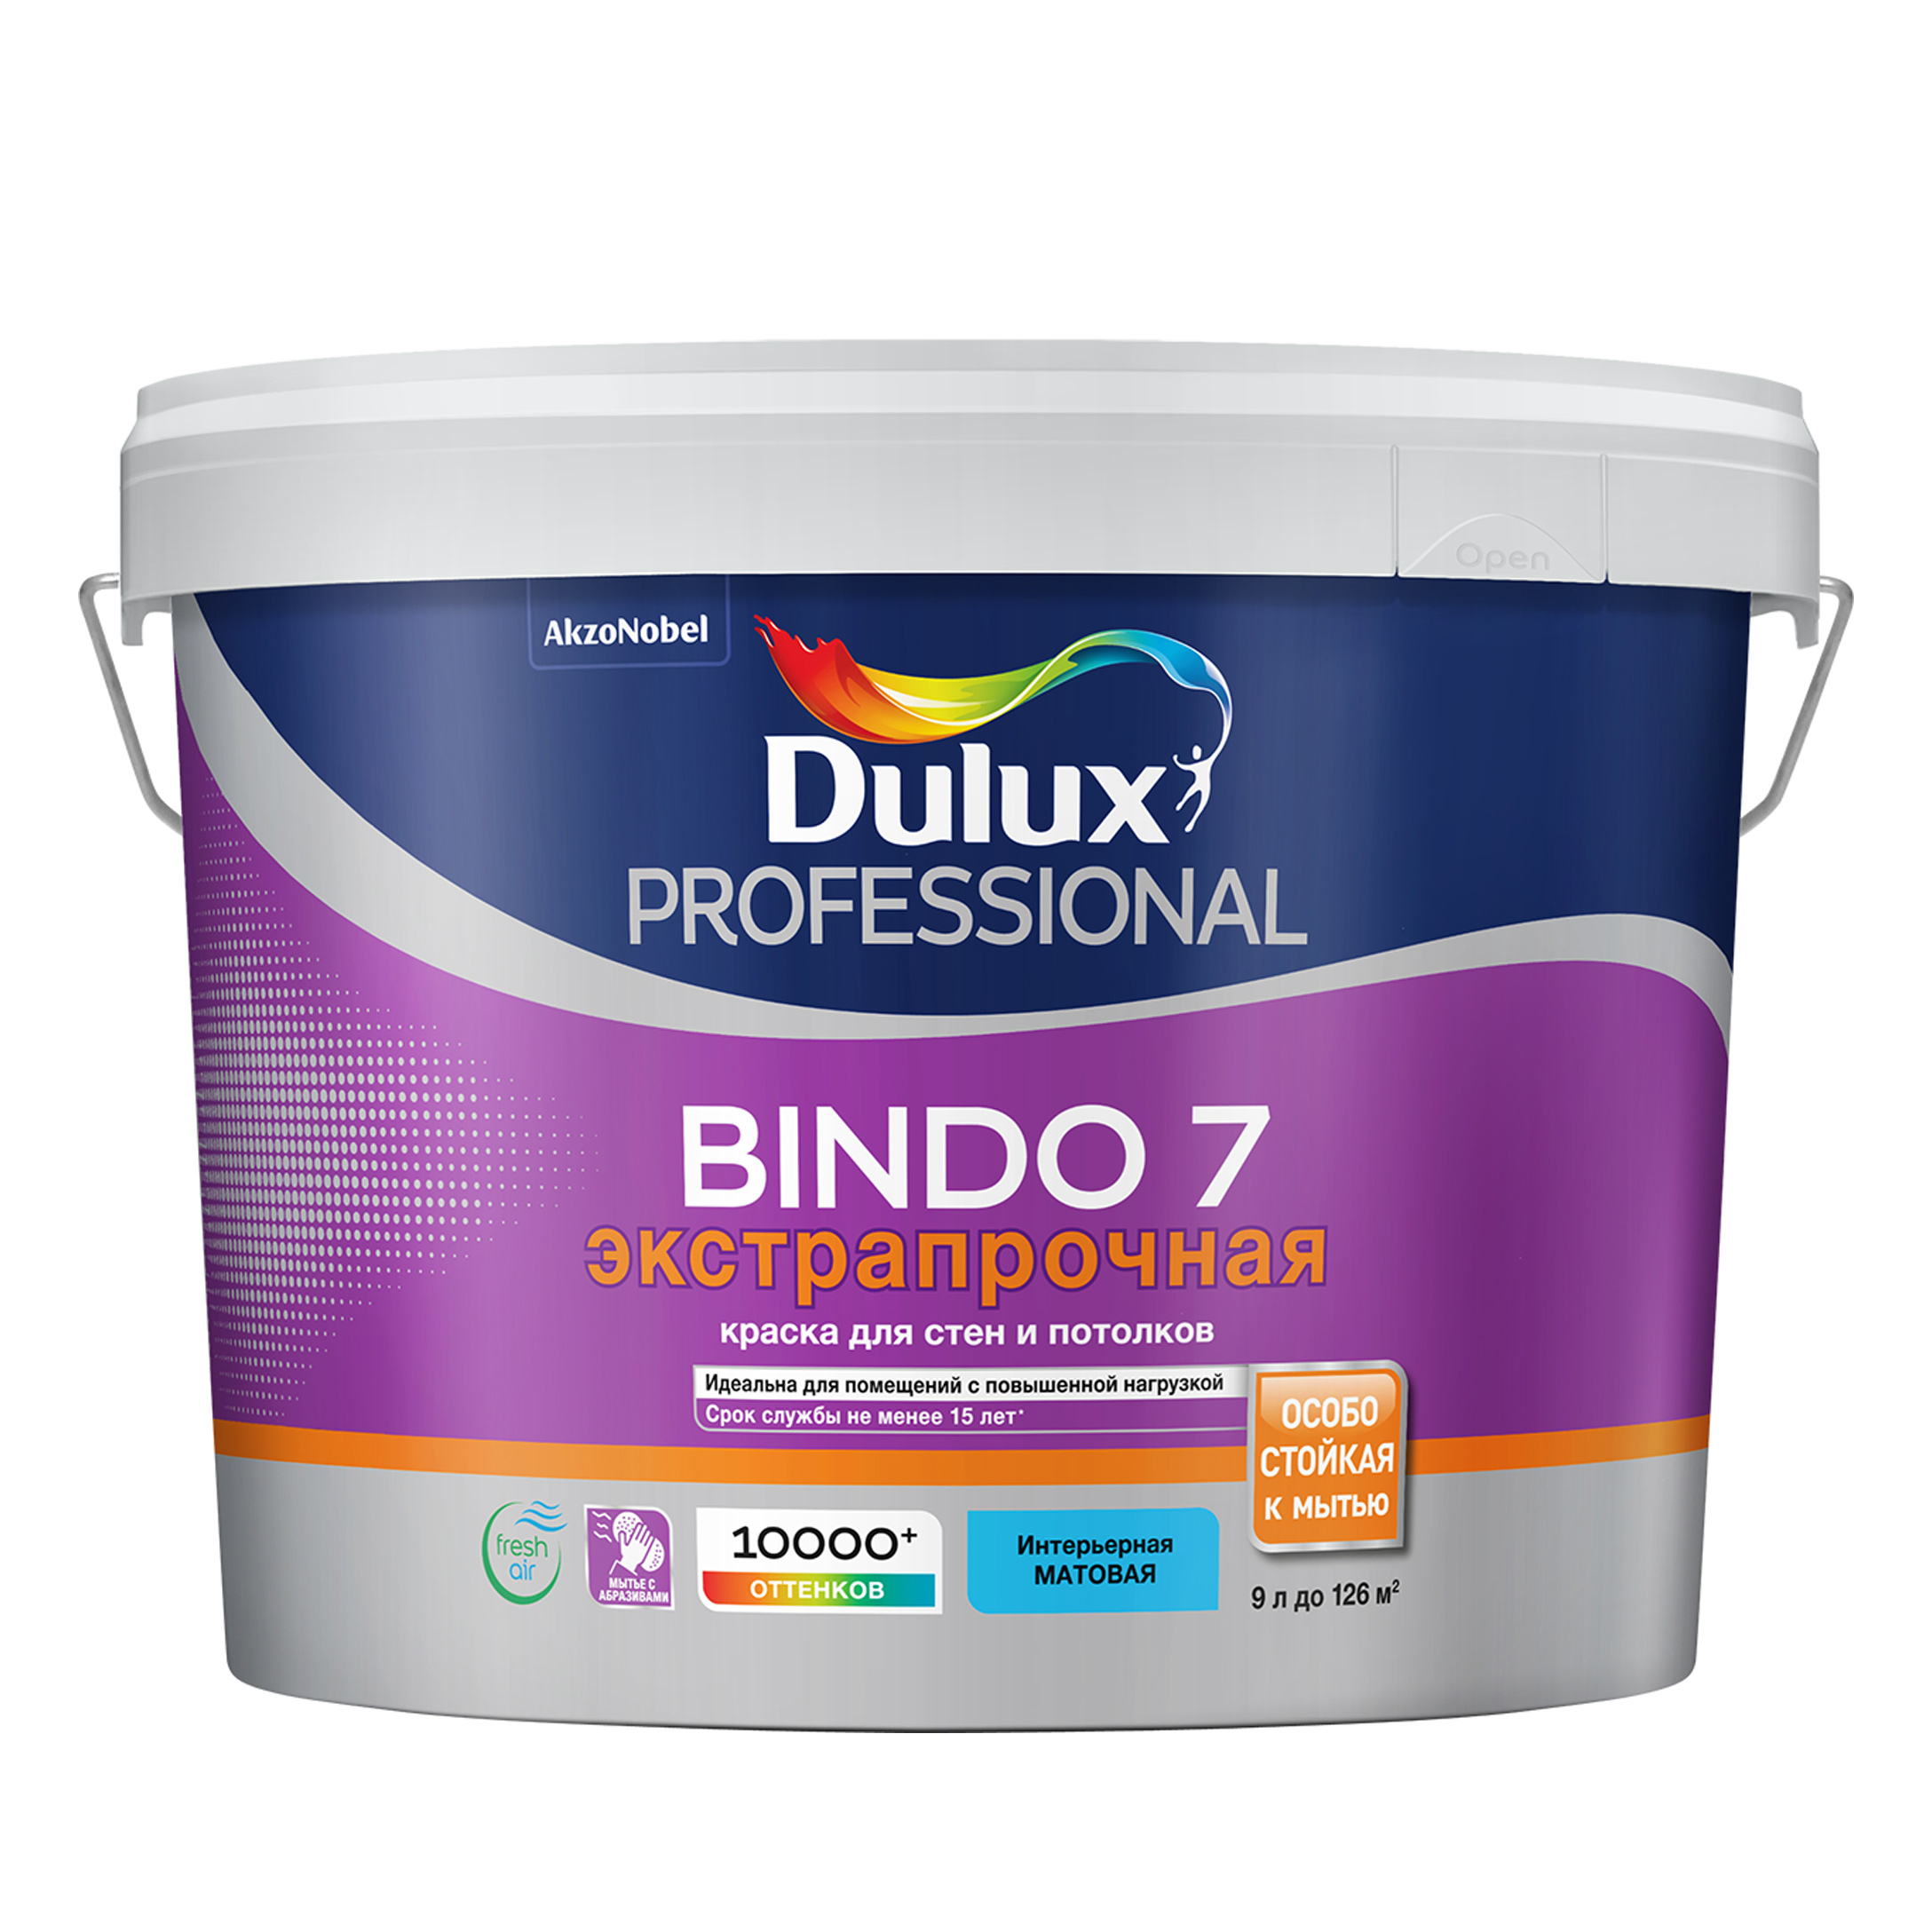 Фото - Краска для стен и потолков латексная экстрапрочная Dulux Professional Bindo 7 матовая база BC 9 л. краска водно дисперсионная dulux bindo 7 экстрапрочная моющаяся основа вс 1 л